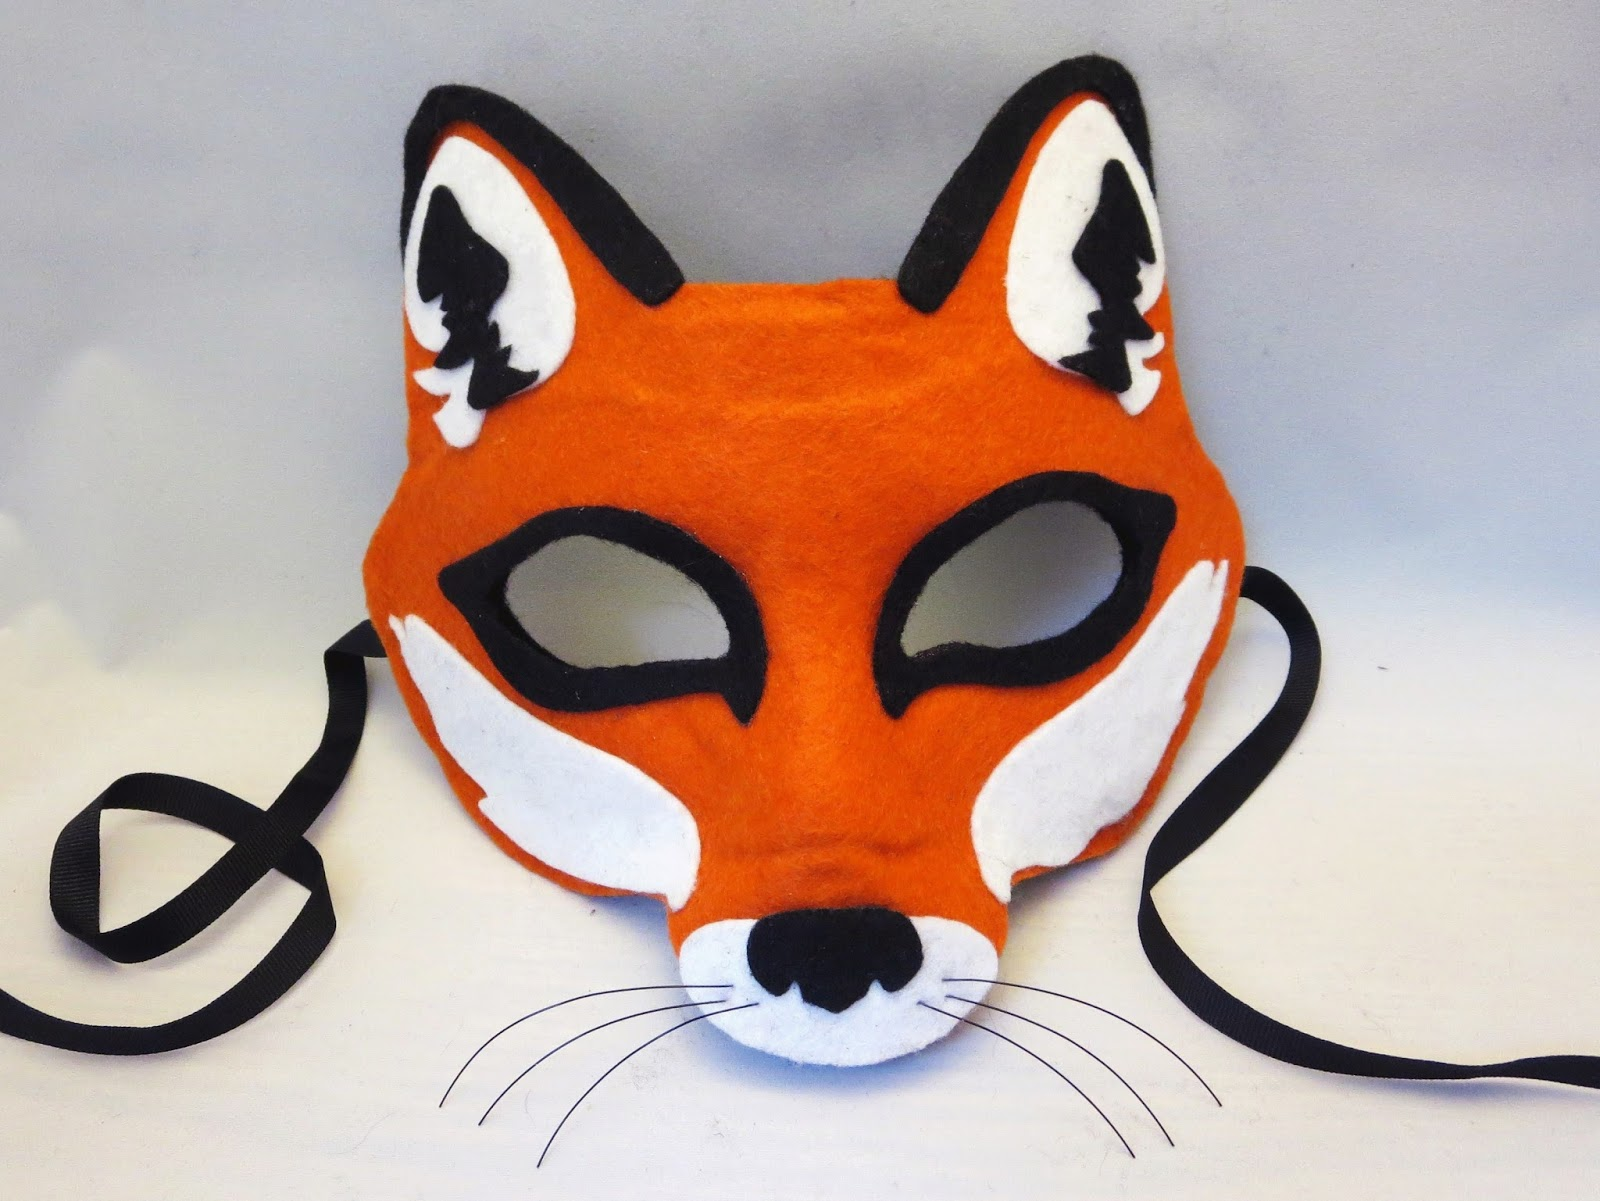 Happenstance: Wedding Felt Animal Masks